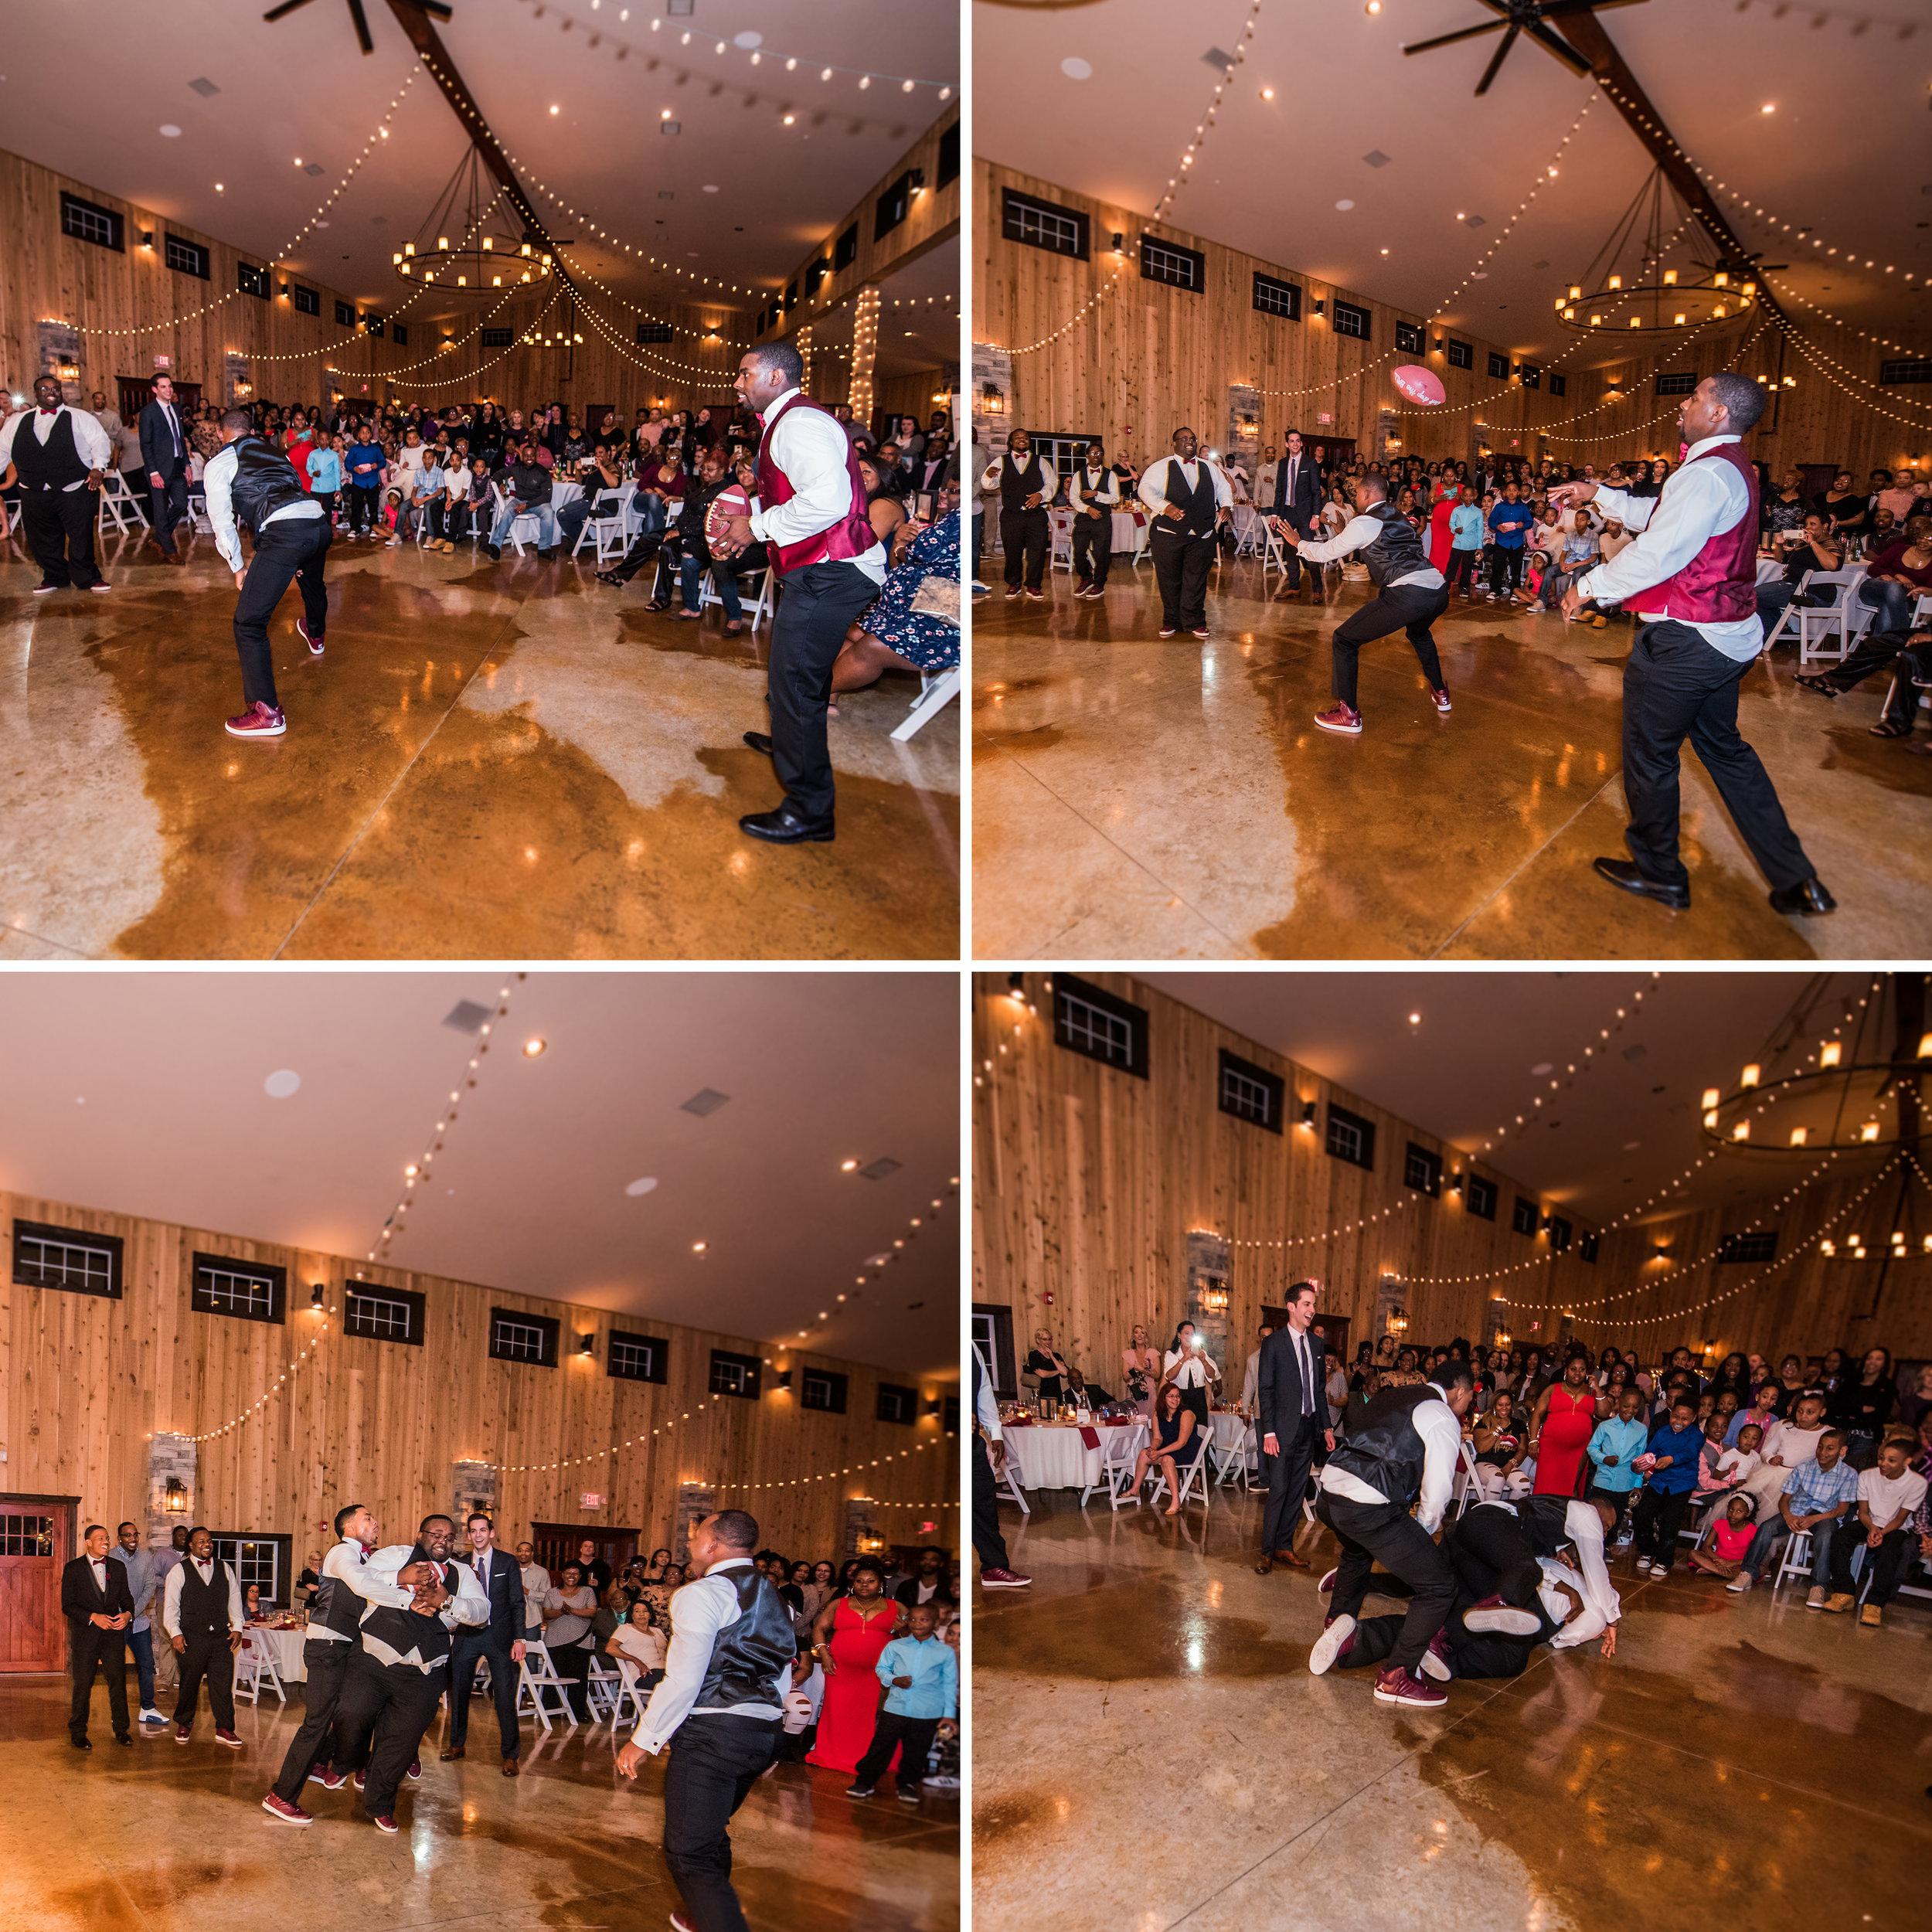 Burlington Iowa Wedding Midwest Photographer Melissa Cervantes _ Chantelle and Isaiah 3444.jpg